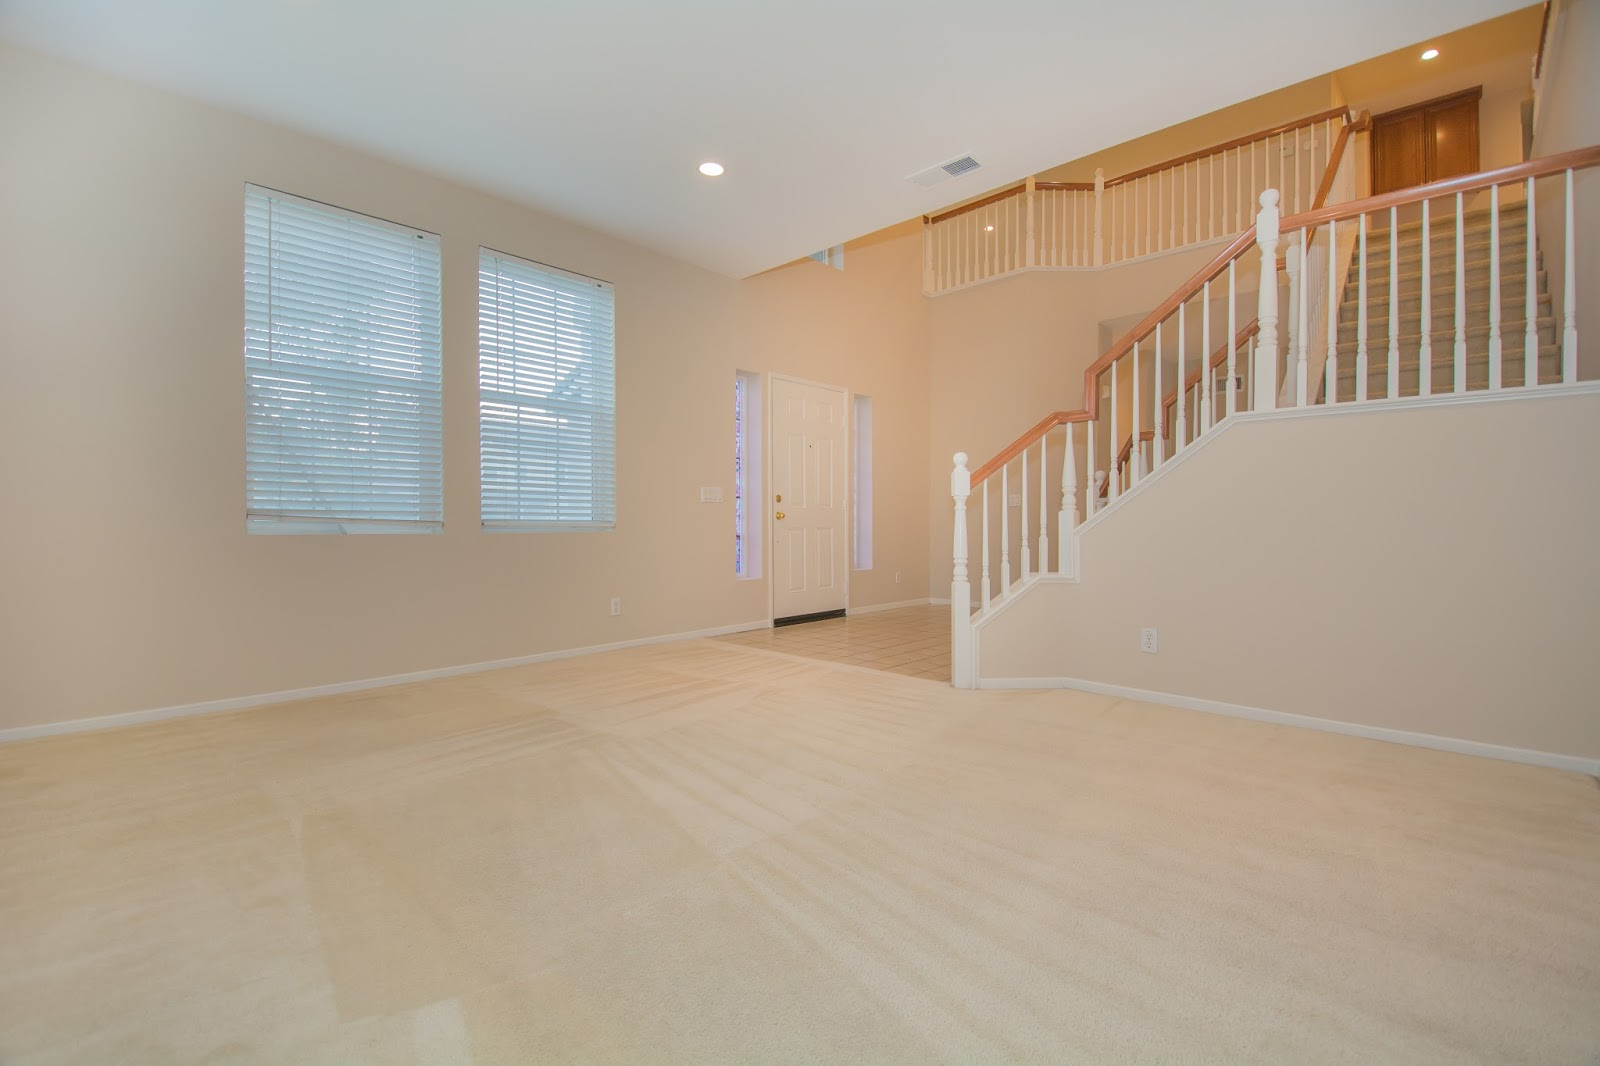 20 Bedroom House For Rent In Eastvale California Vista Property